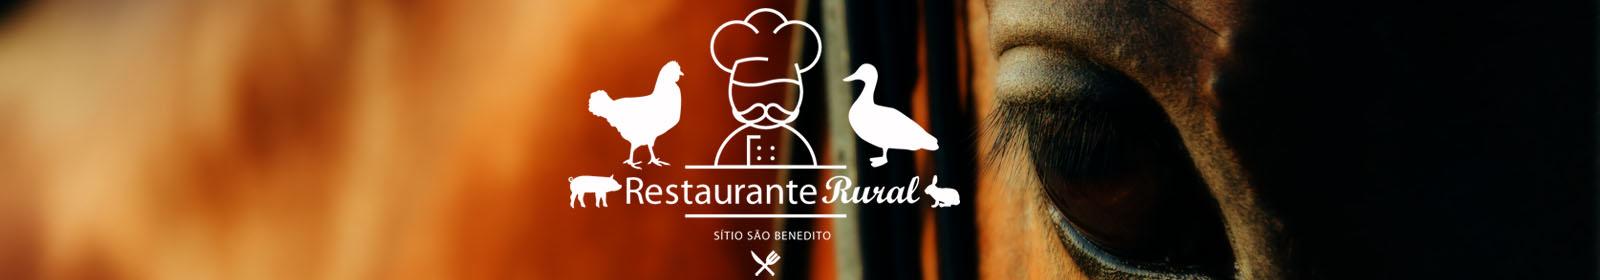 Restaurante Rura